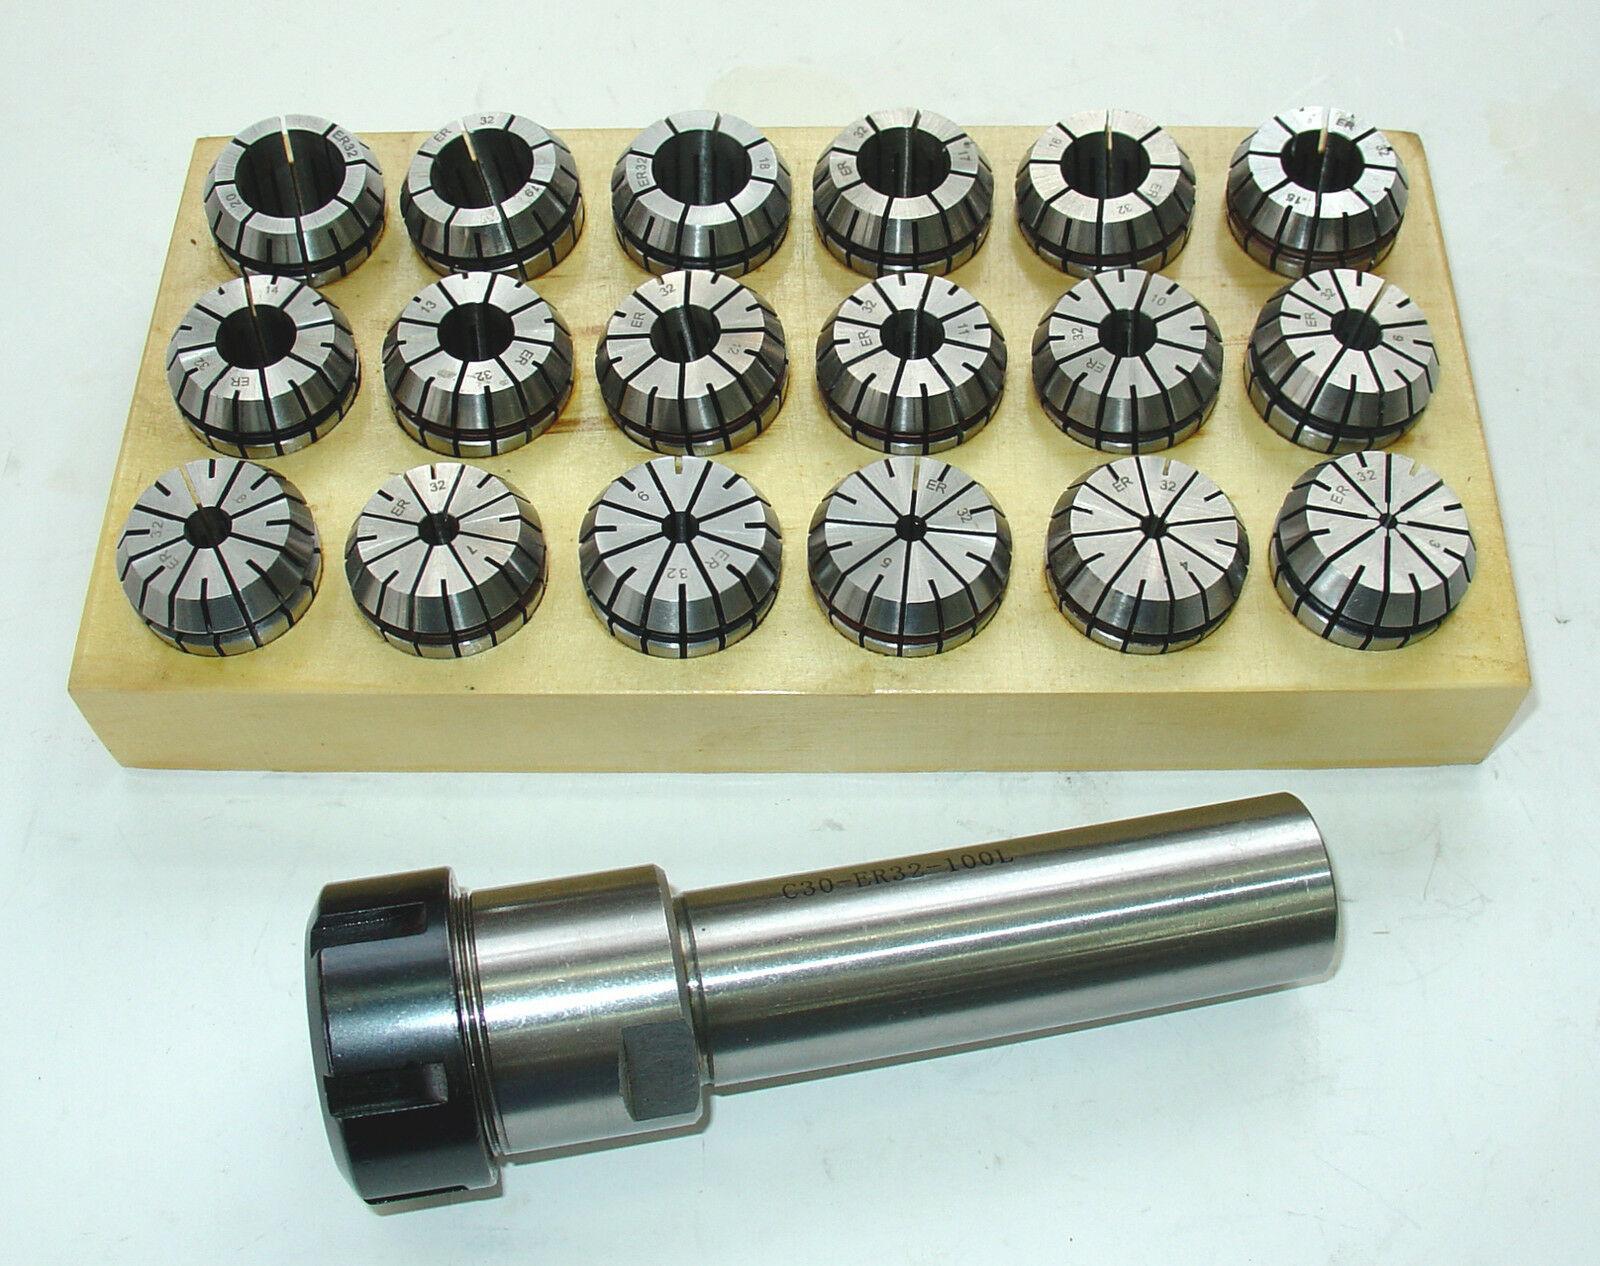 D30 Spannzangenfutter zylindrisch ER25 L100